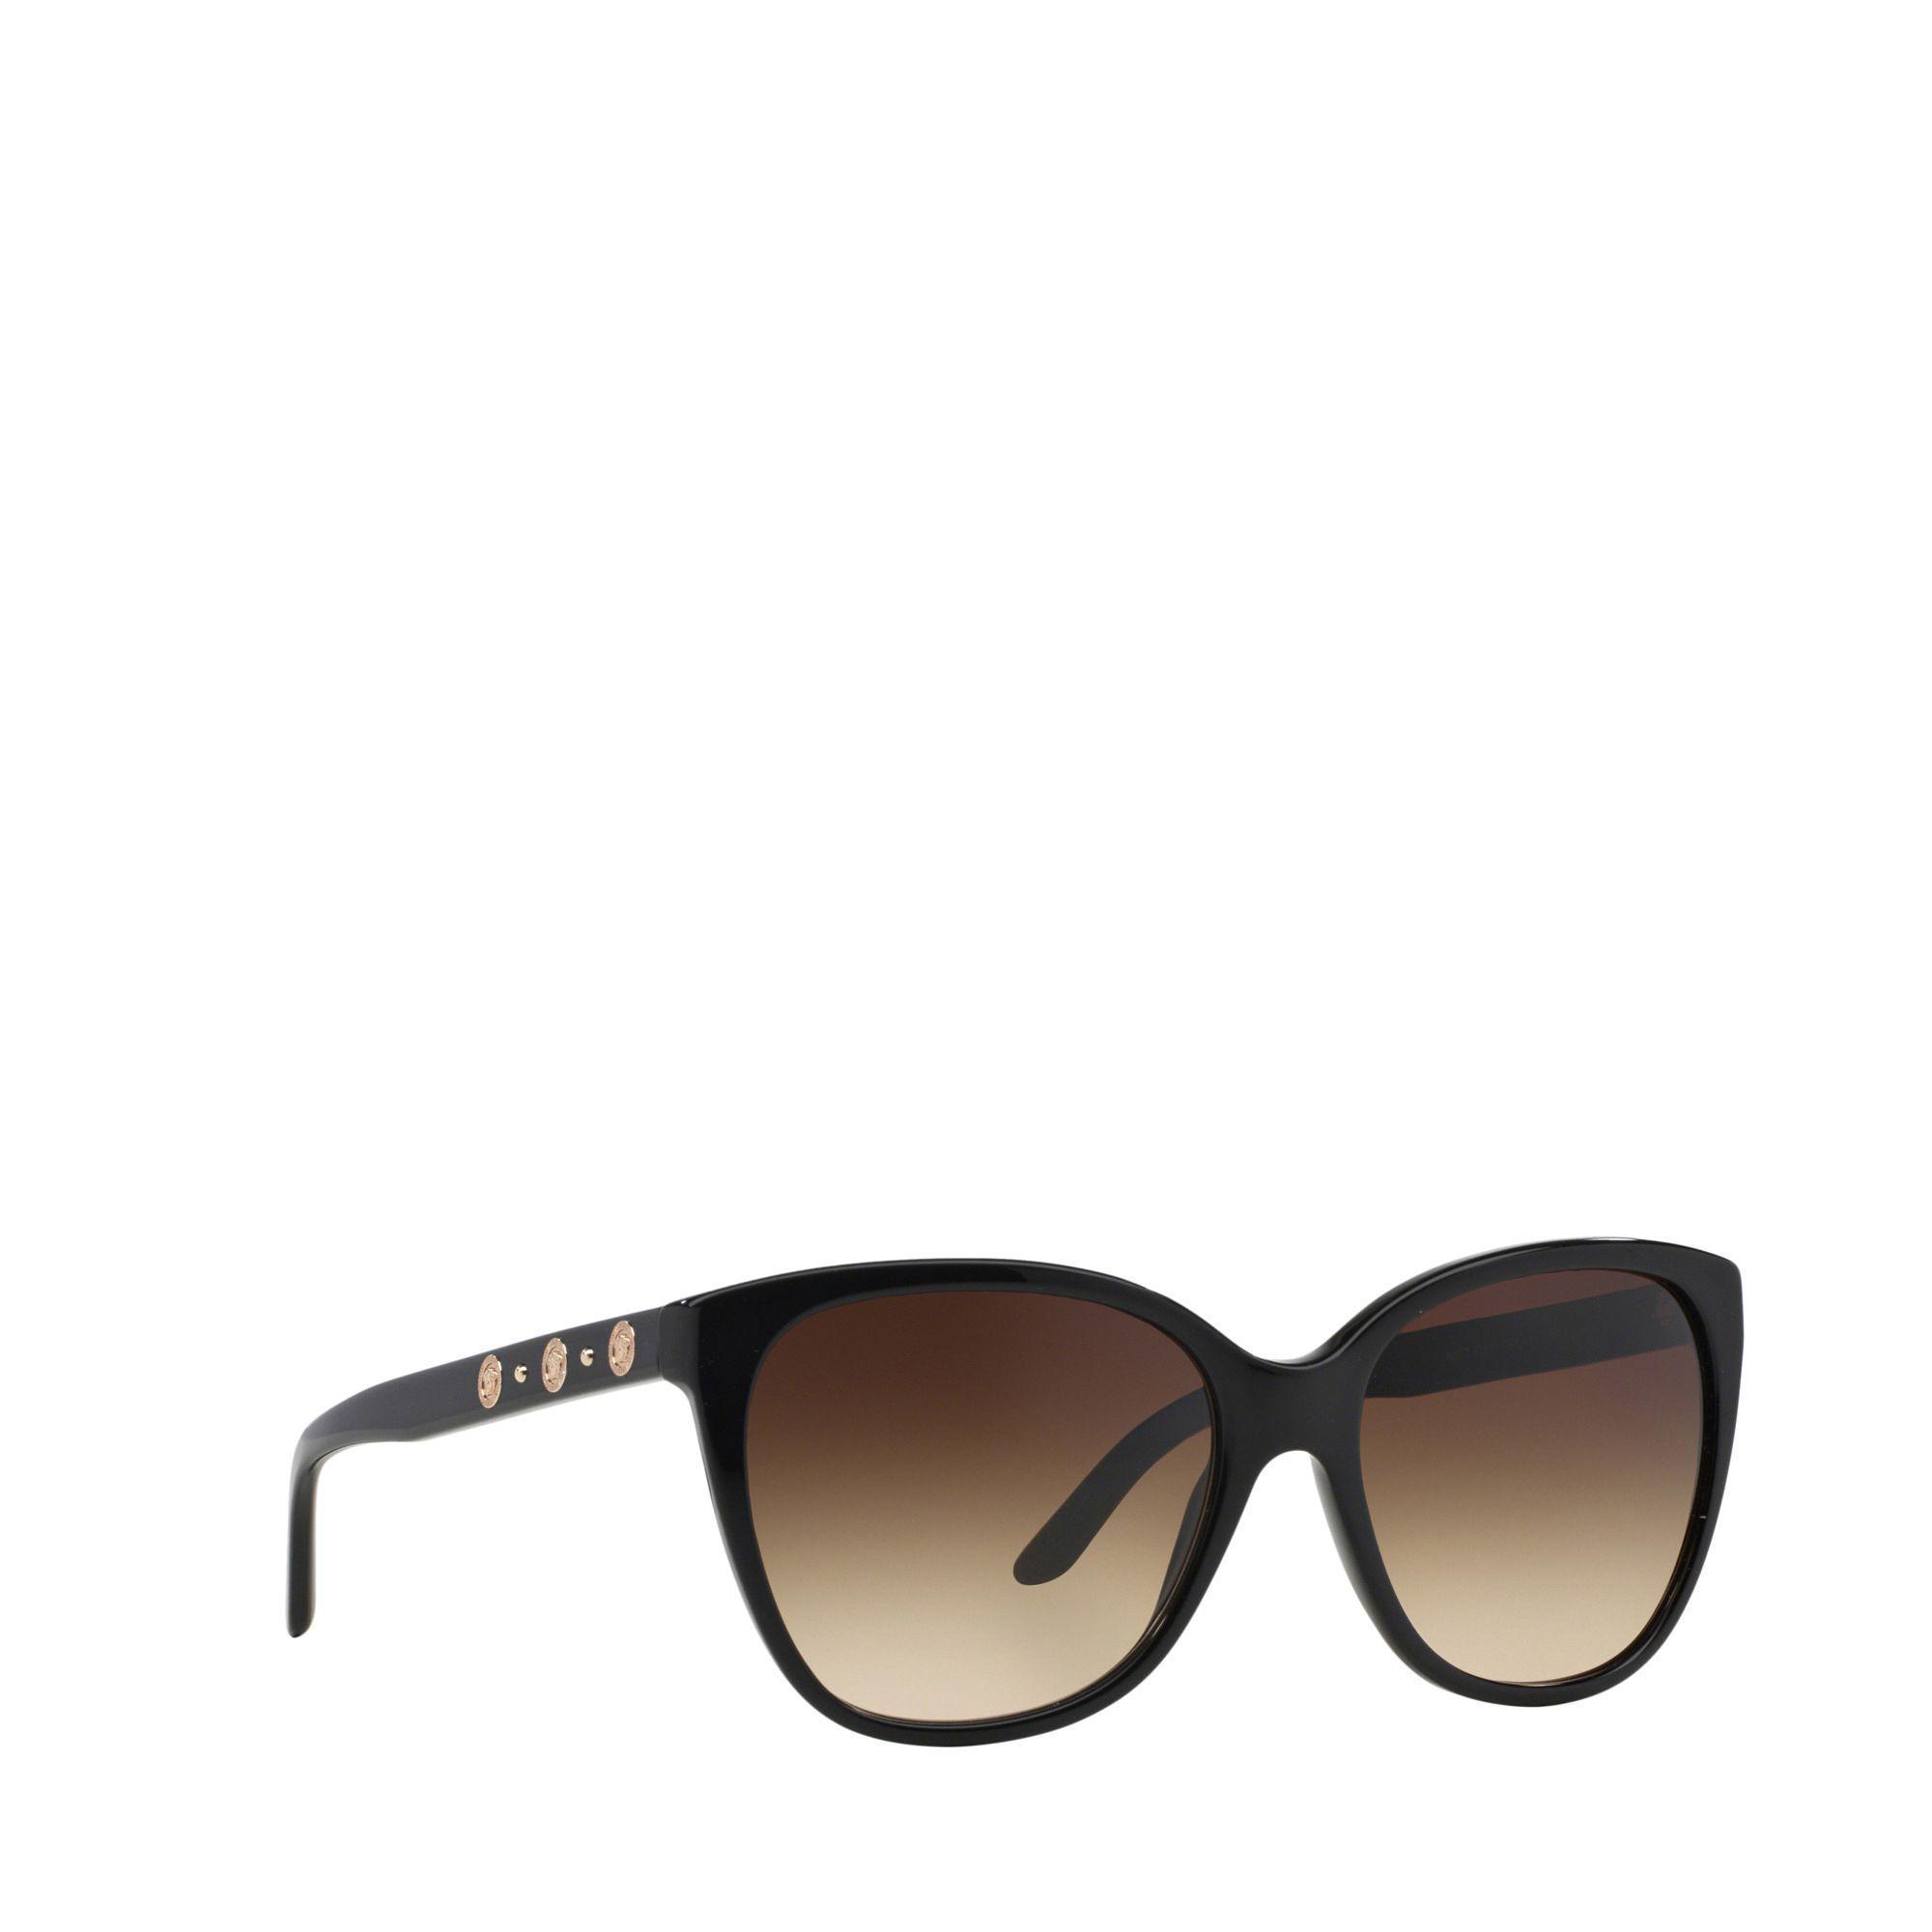 980a834198fe Versace Black Square Ve4281 Sunglasses in Black - Lyst